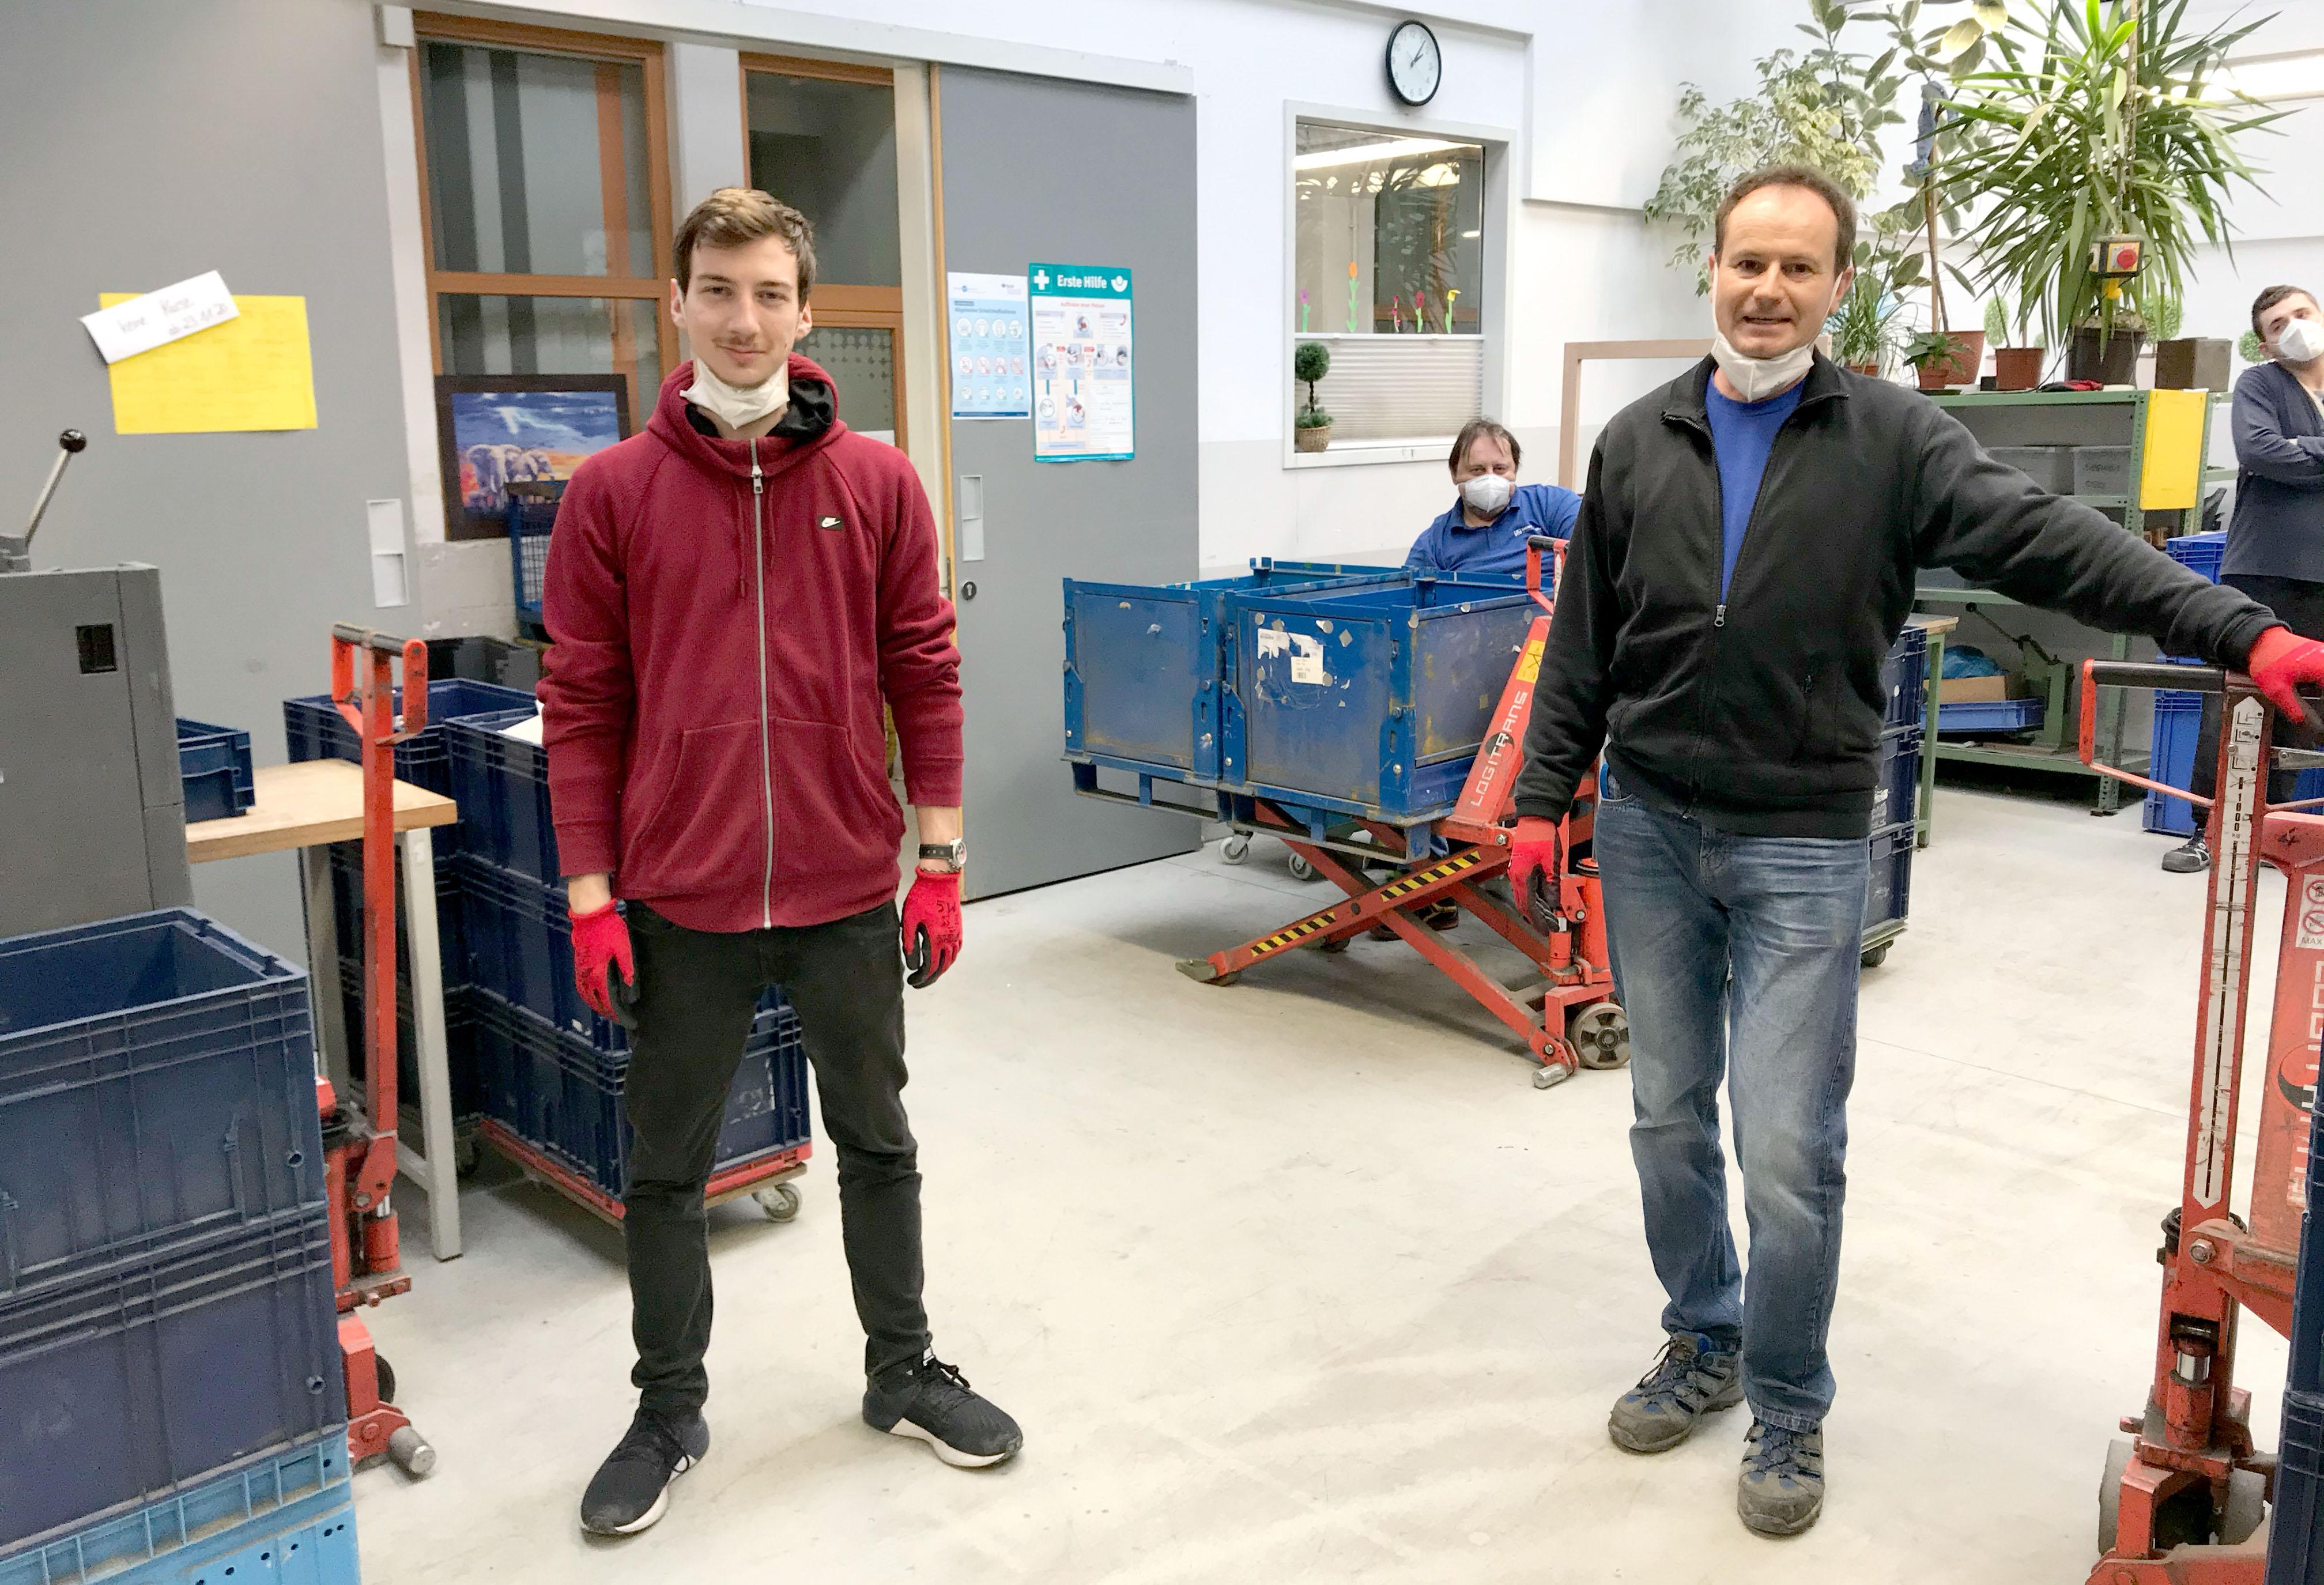 Das Leitungsteam der Fertigung 4 mit Katrin Weber und Rainer Full, ergänzt seit 17. Mai Manuel Schobert.